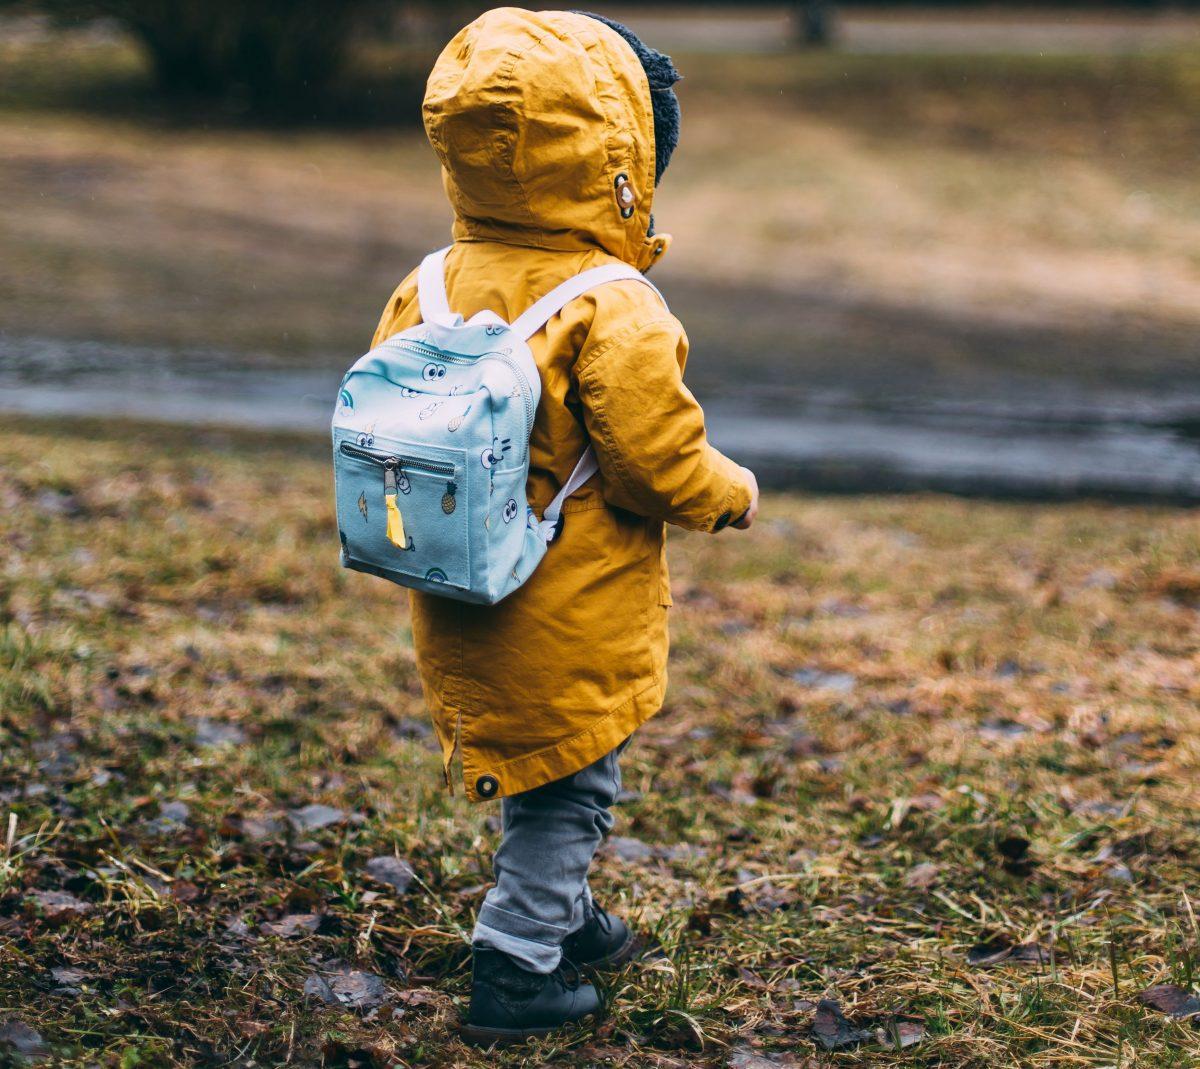 preparing your child for nursery or pre-school